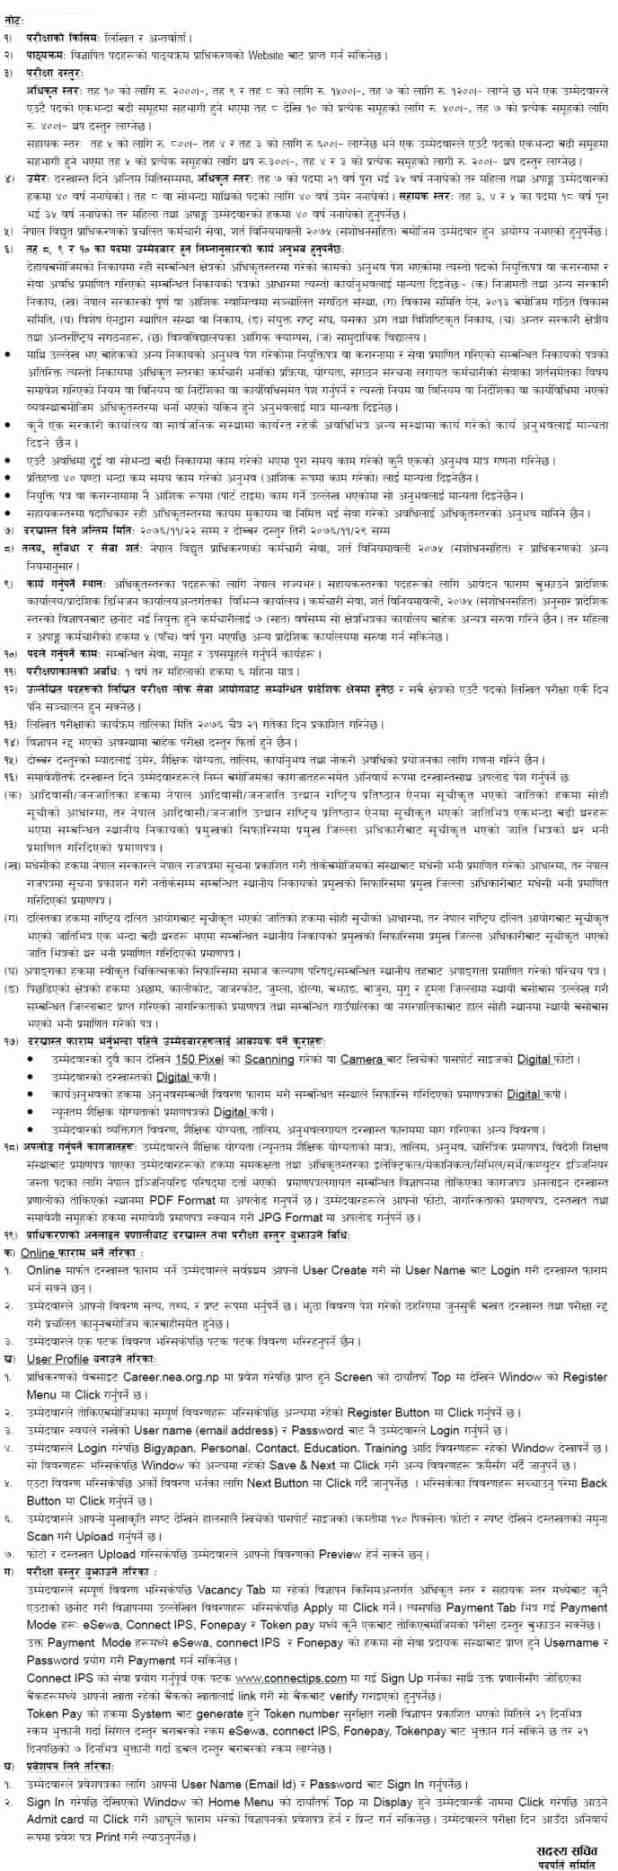 Nepal Electricity Authority job